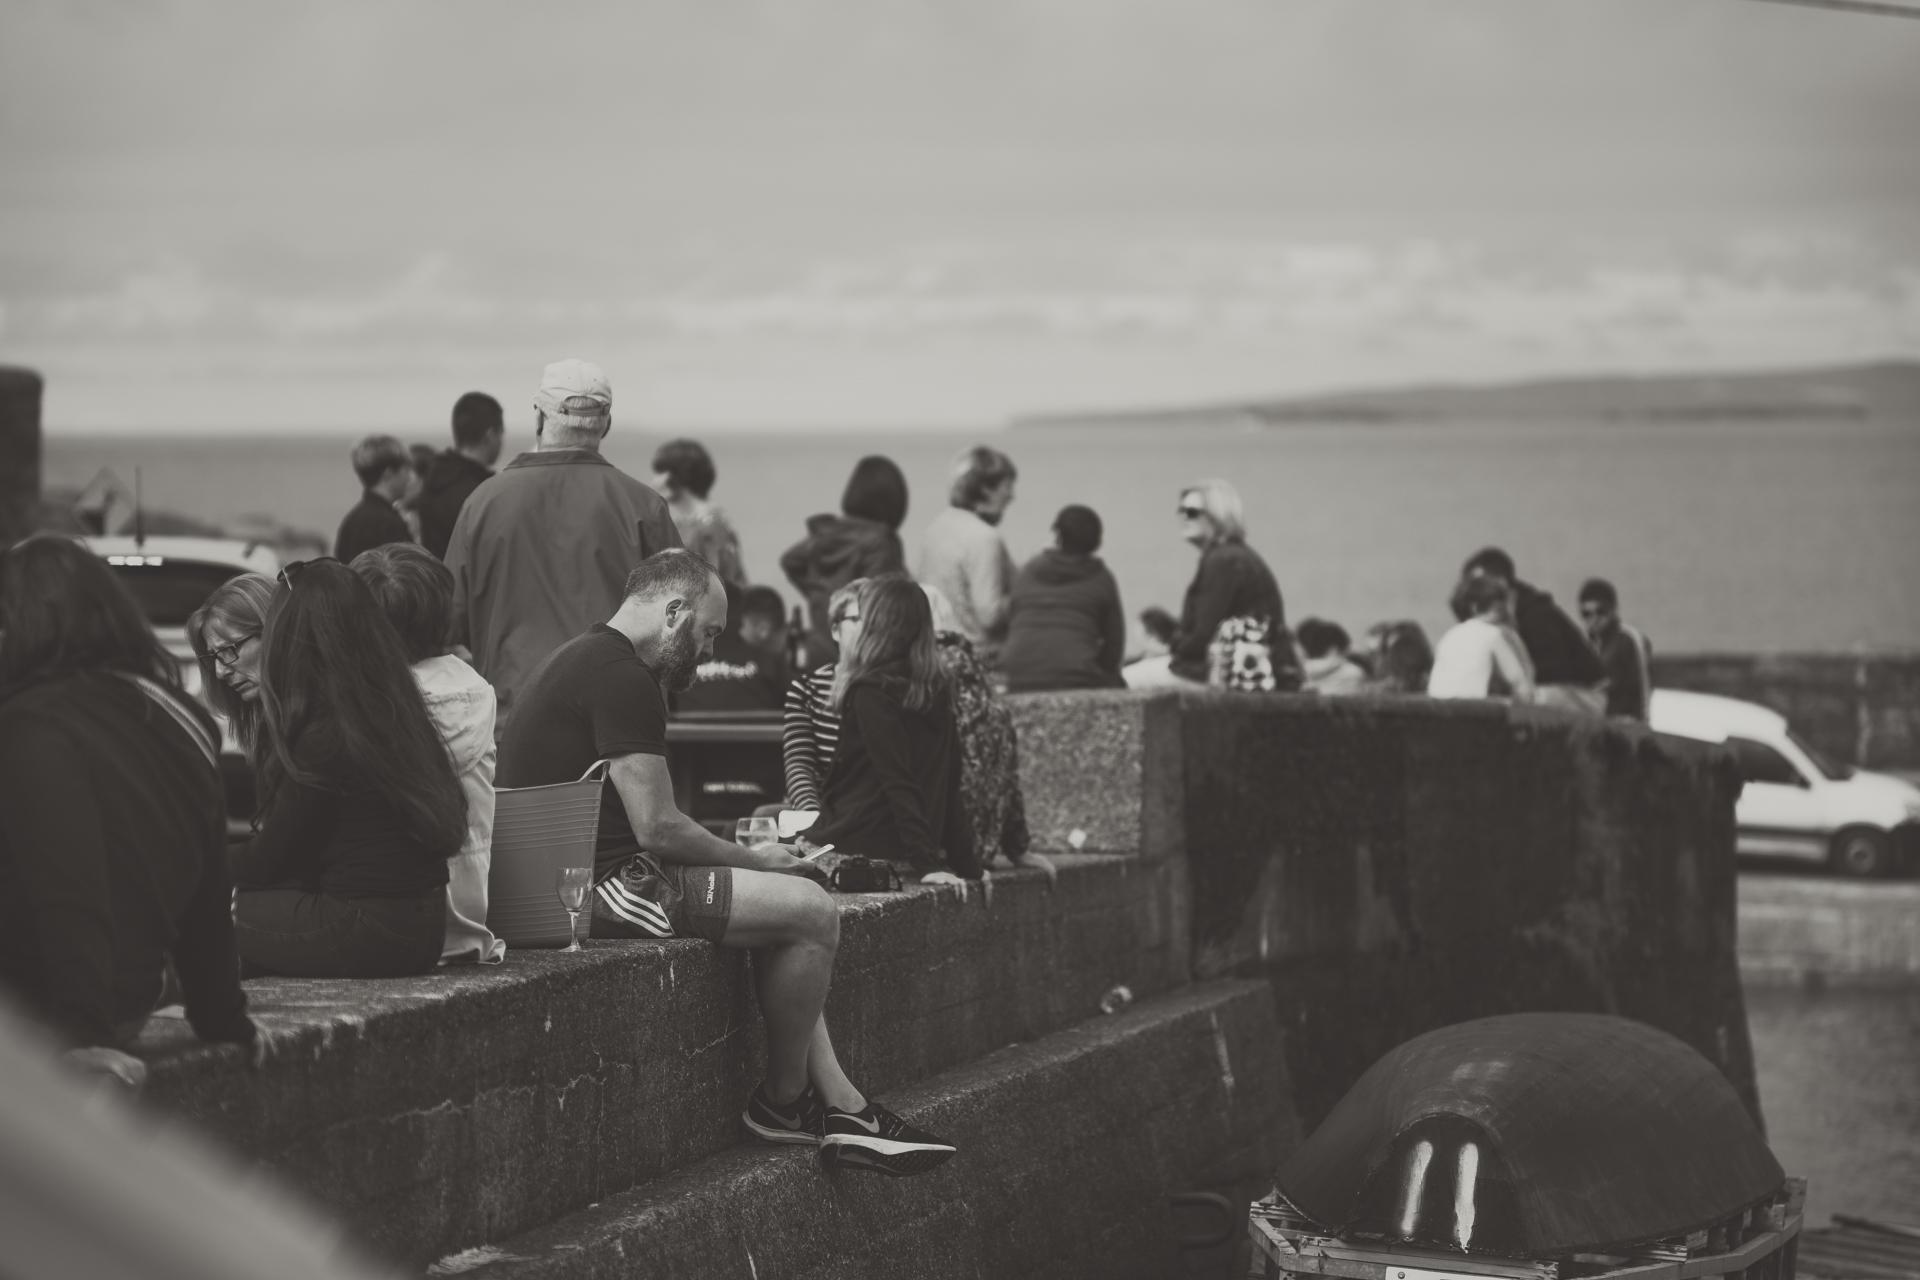 Ireland. Wild Atlantic Way. Kerry. Counthy Kerry. Travel photography. Landscape photography. Blog. Irish. Travelling Ireland. Ireland west coast. Wild Landscape. Trip. Vacation. -10.jpg